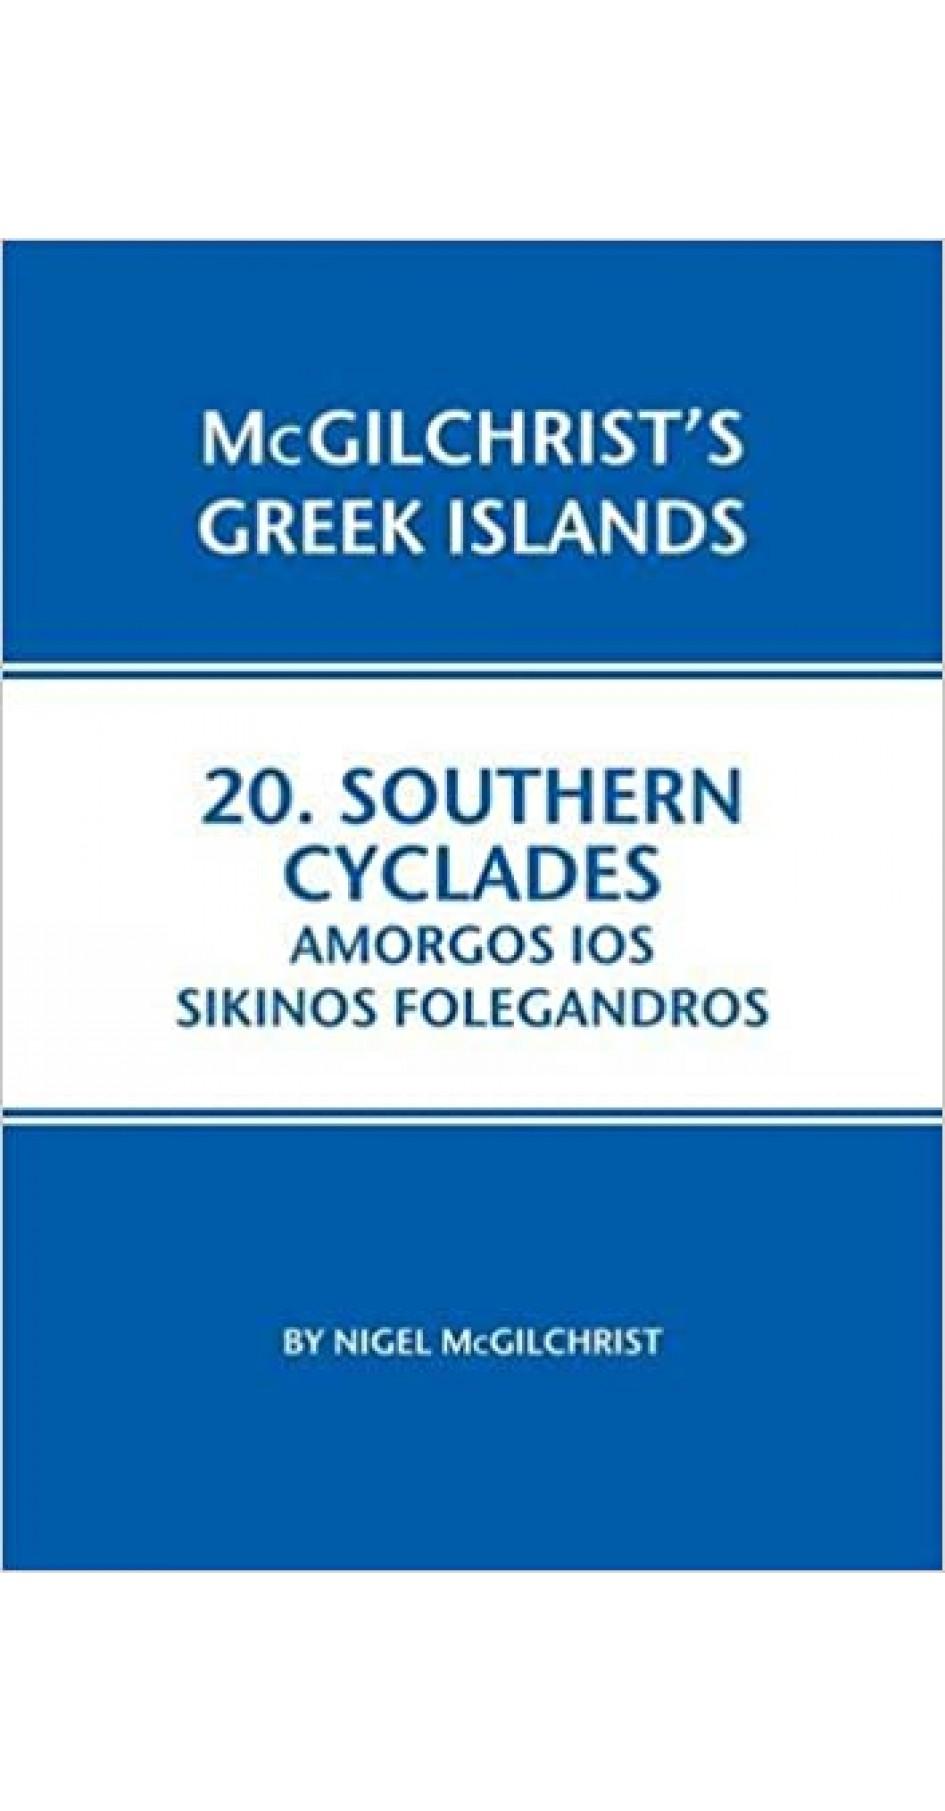 Southern Cyclades: Amorgos, Ios, Sikinos, Folegandros